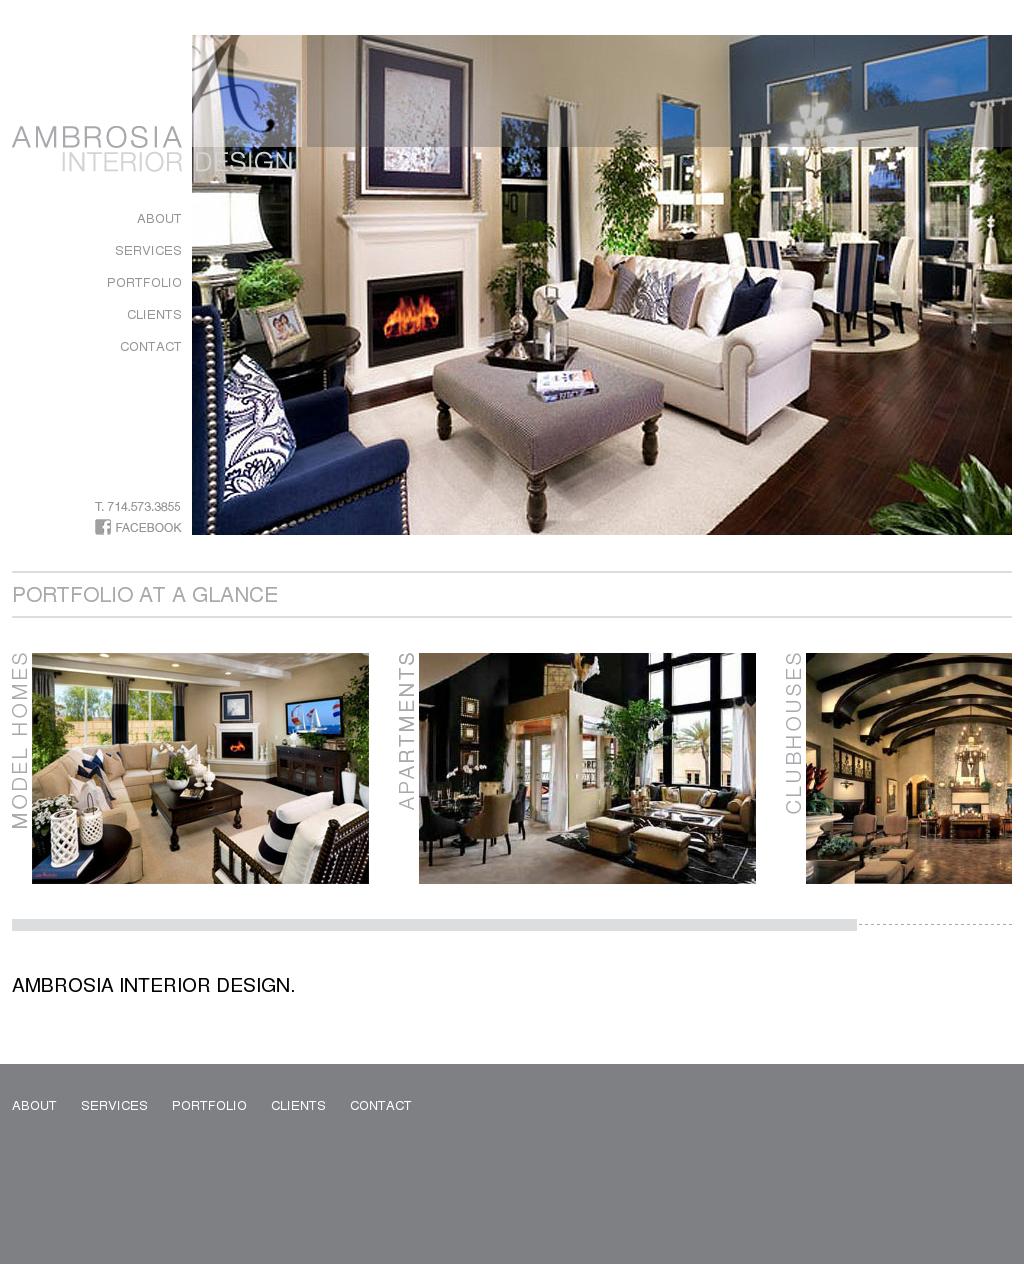 Ambrosia Interior Design Competitors Revenue and Employees - Owler Company Profile  sc 1 st  Owler & Ambrosia Interior Design Competitors Revenue and Employees - Owler ...